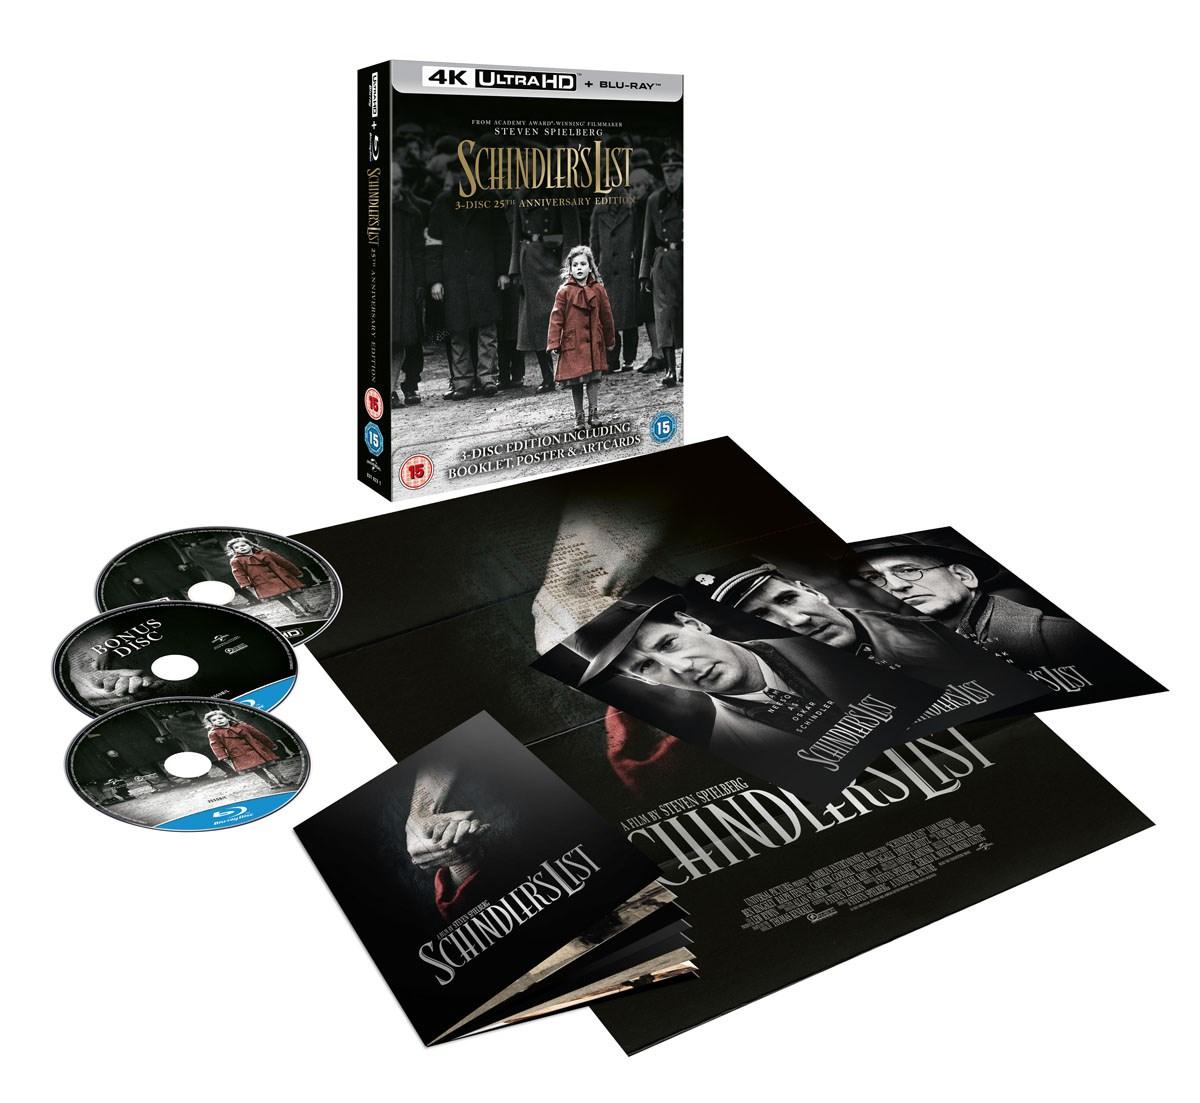 Schindler's List 4k 25th Anniversary Edition 4K Ultra HD HDR + Blu-ray für 15,29€ @ Zoom